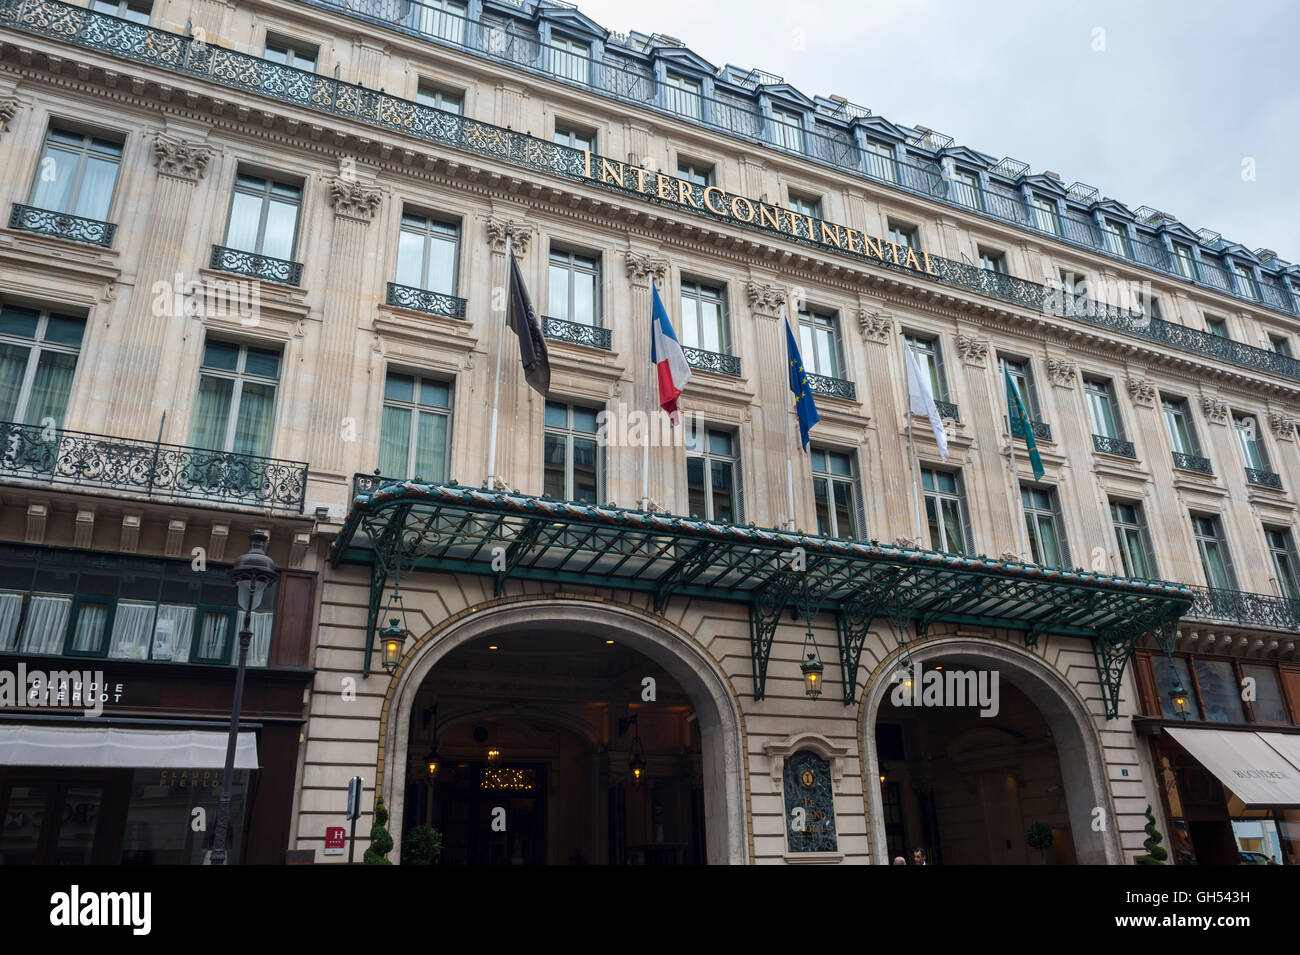 intercontinental paris grand hotel stockfotos. Black Bedroom Furniture Sets. Home Design Ideas